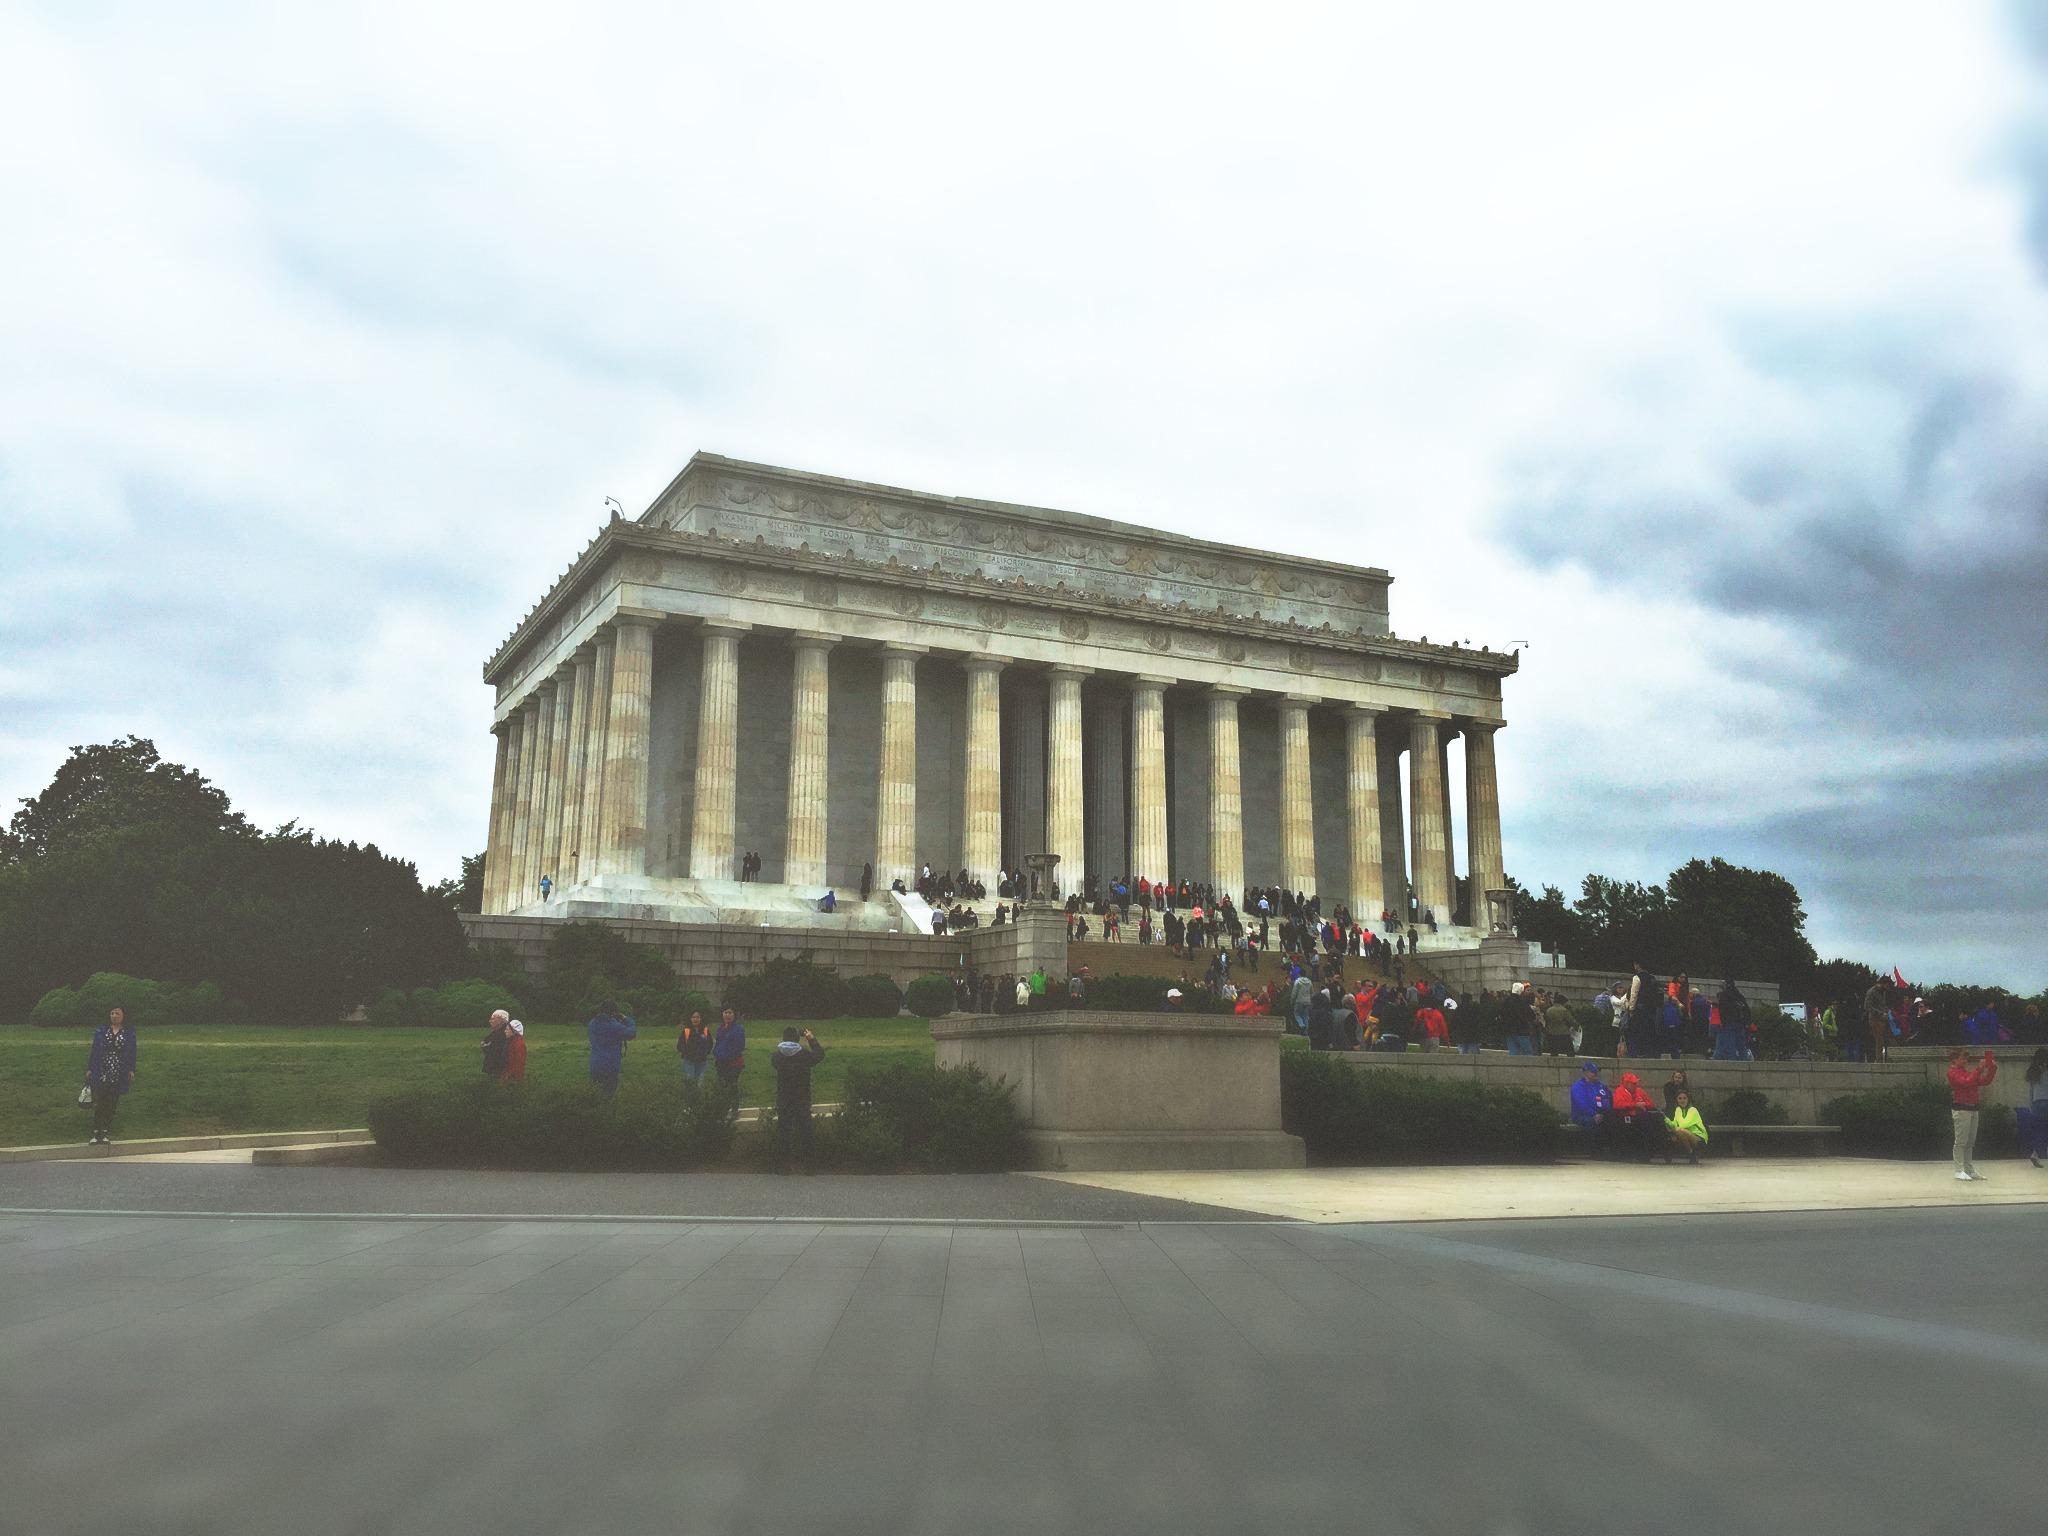 IWashington D.C.: Simply Taralynn